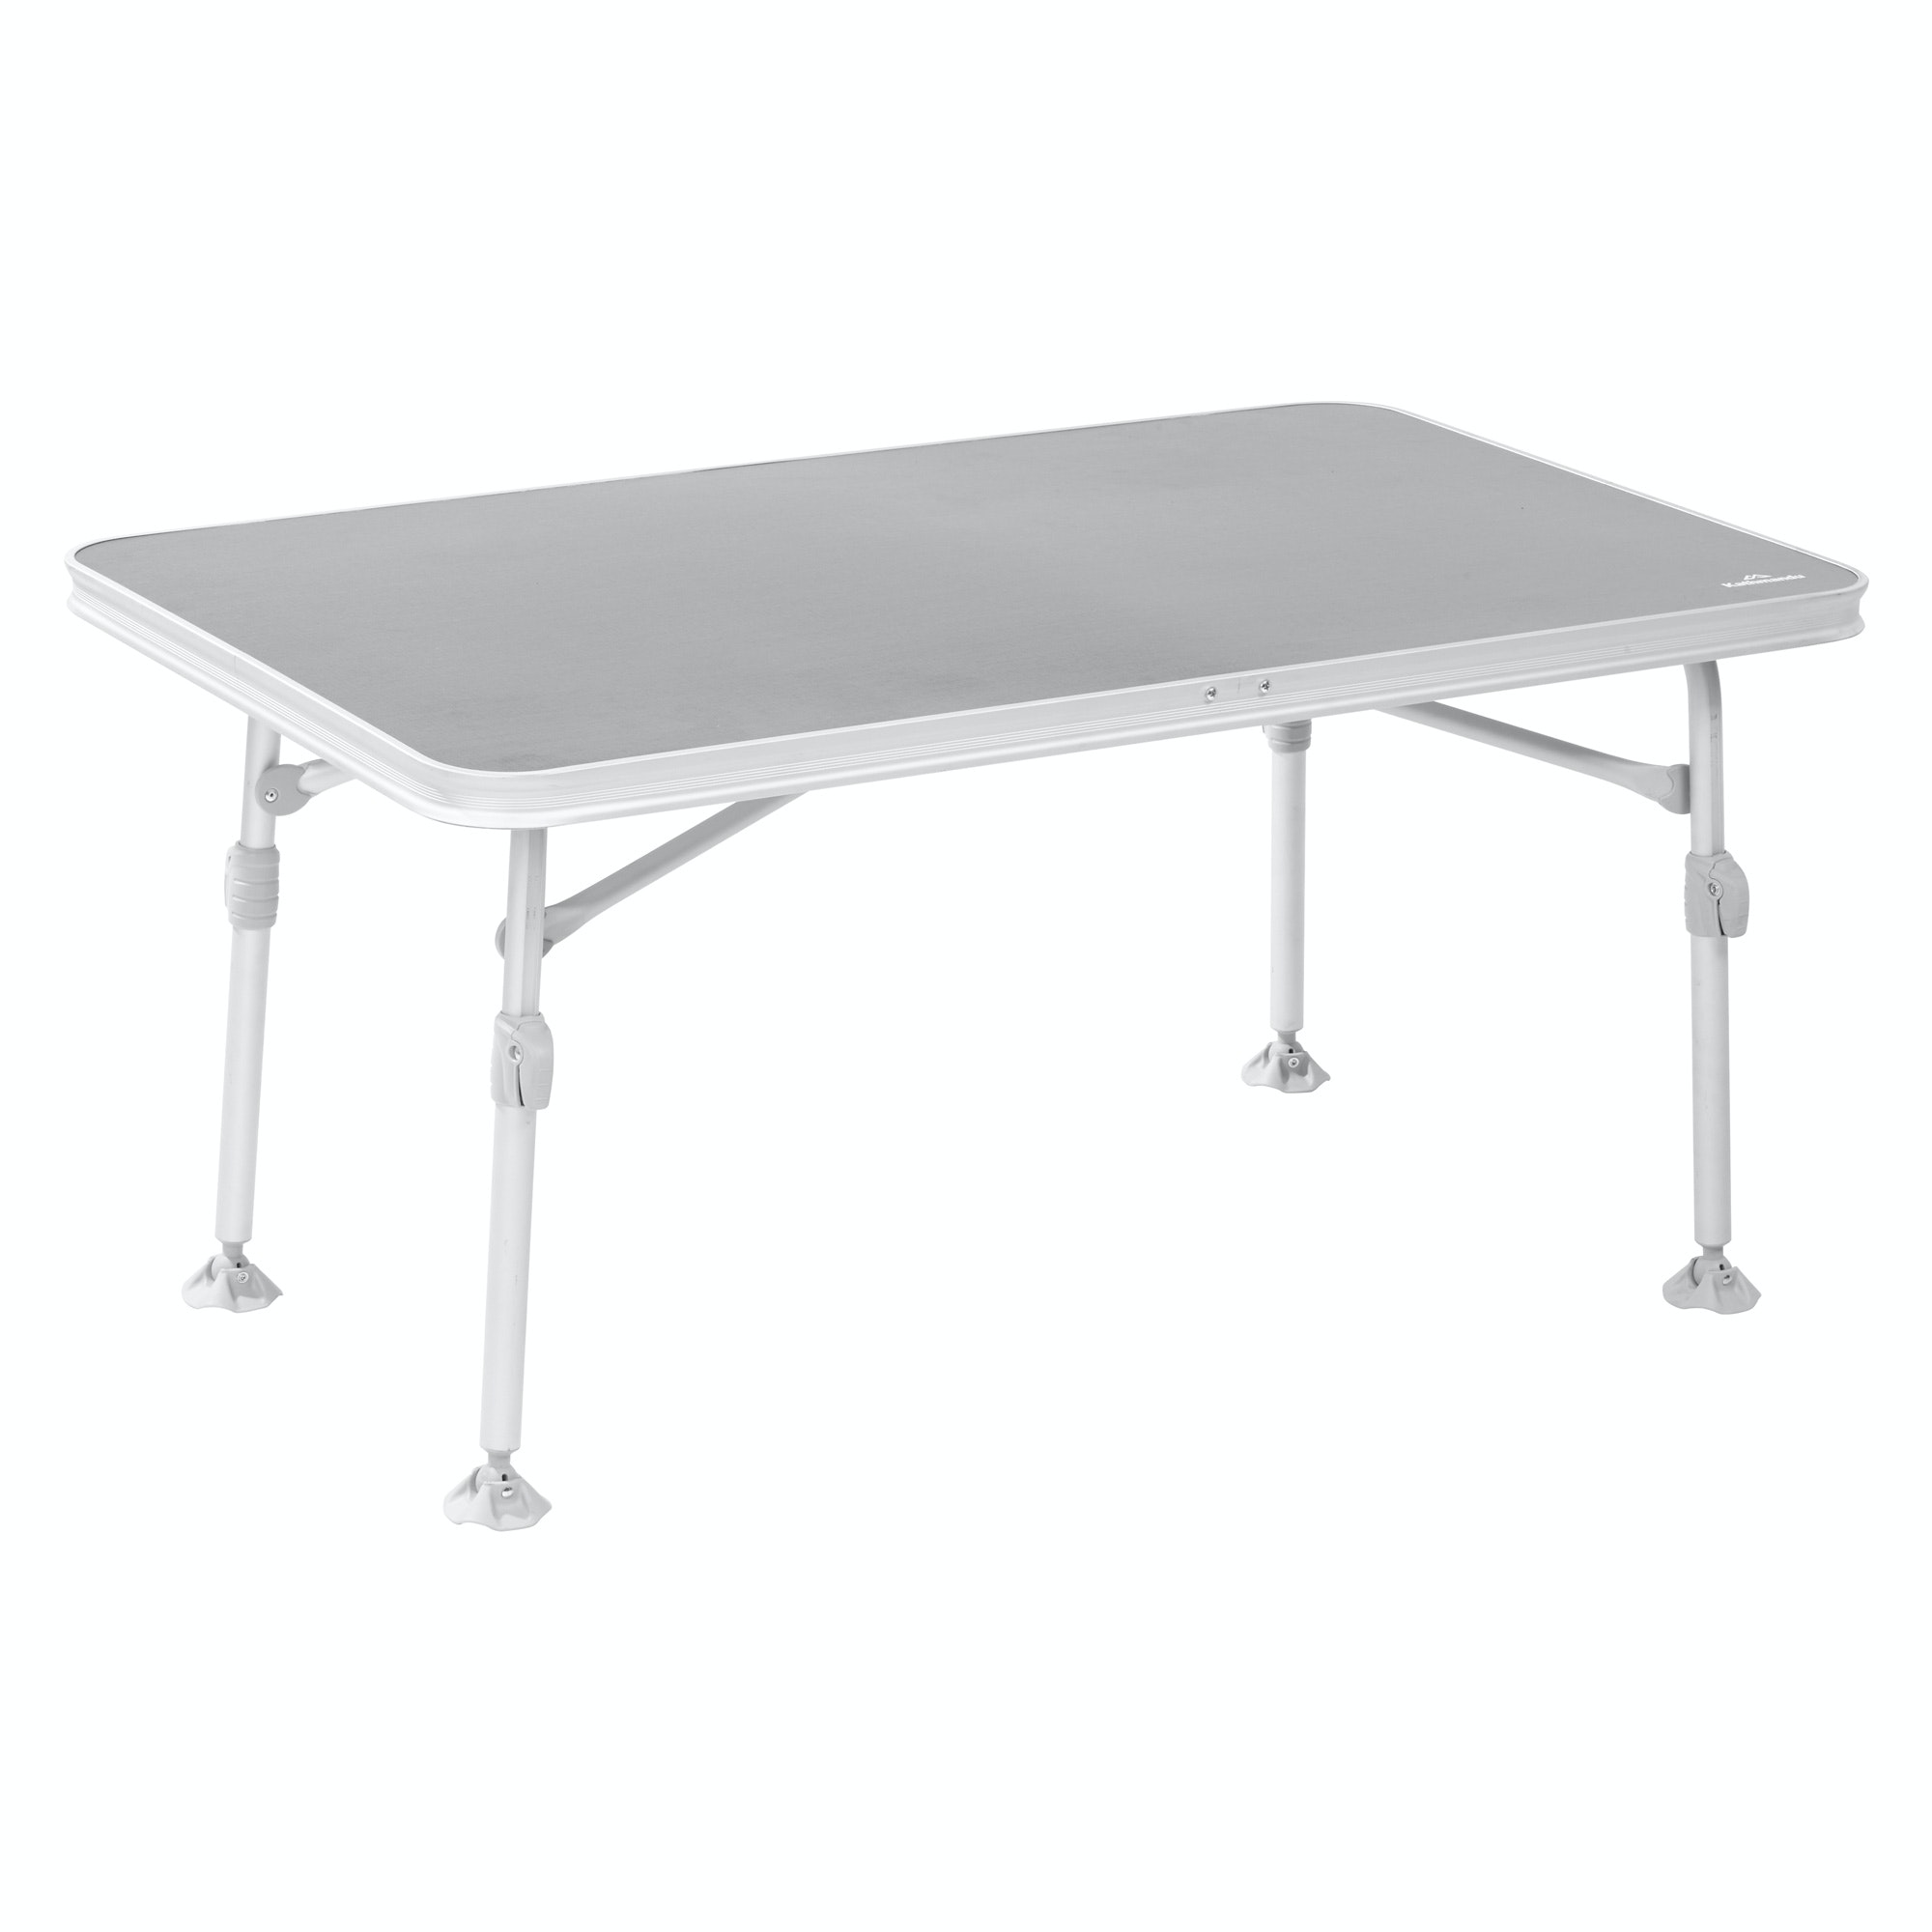 Portable Work Surface Flooring : Kathmandu retreat table adjustable portable work surface